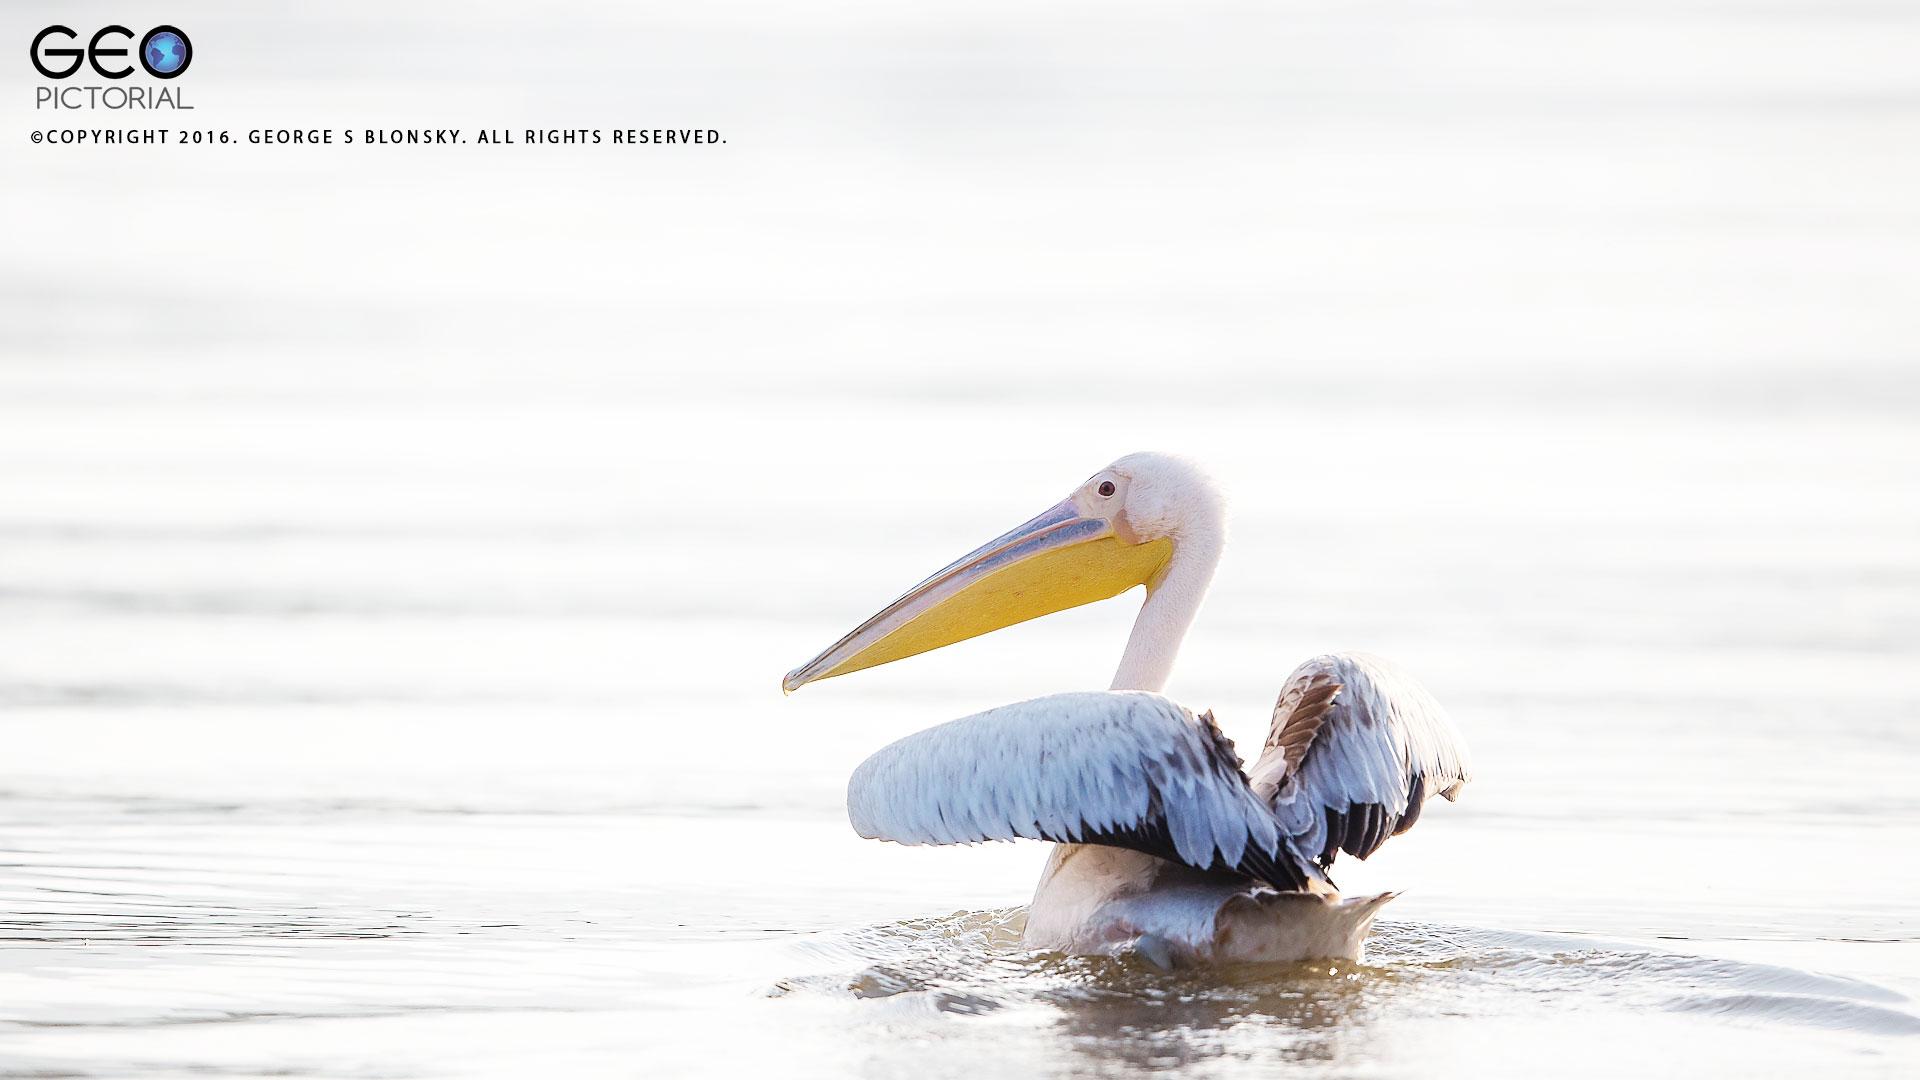 Juvenile White Pelican